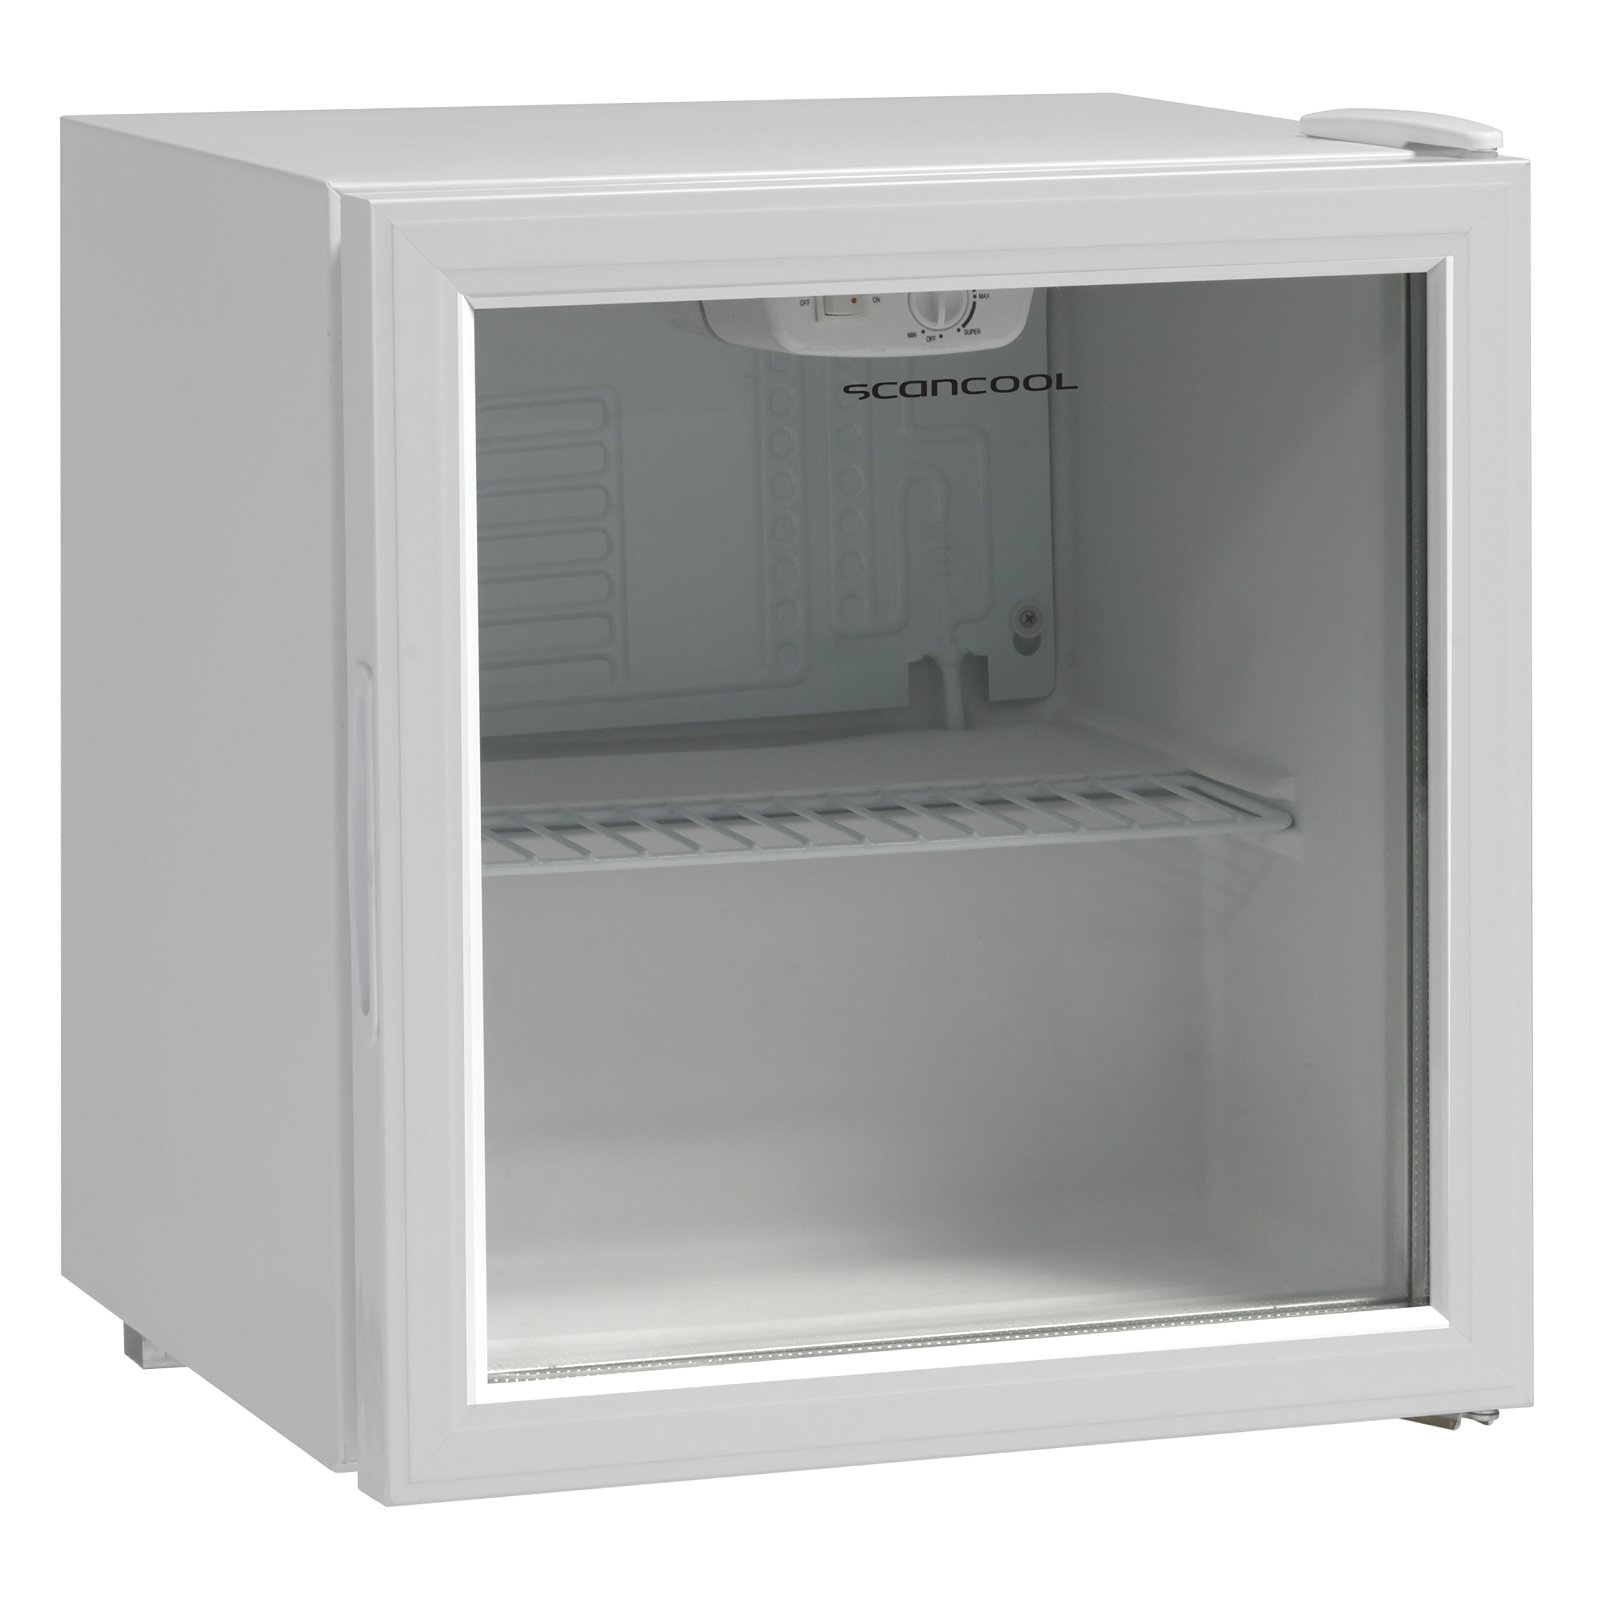 Scandomestic display køler